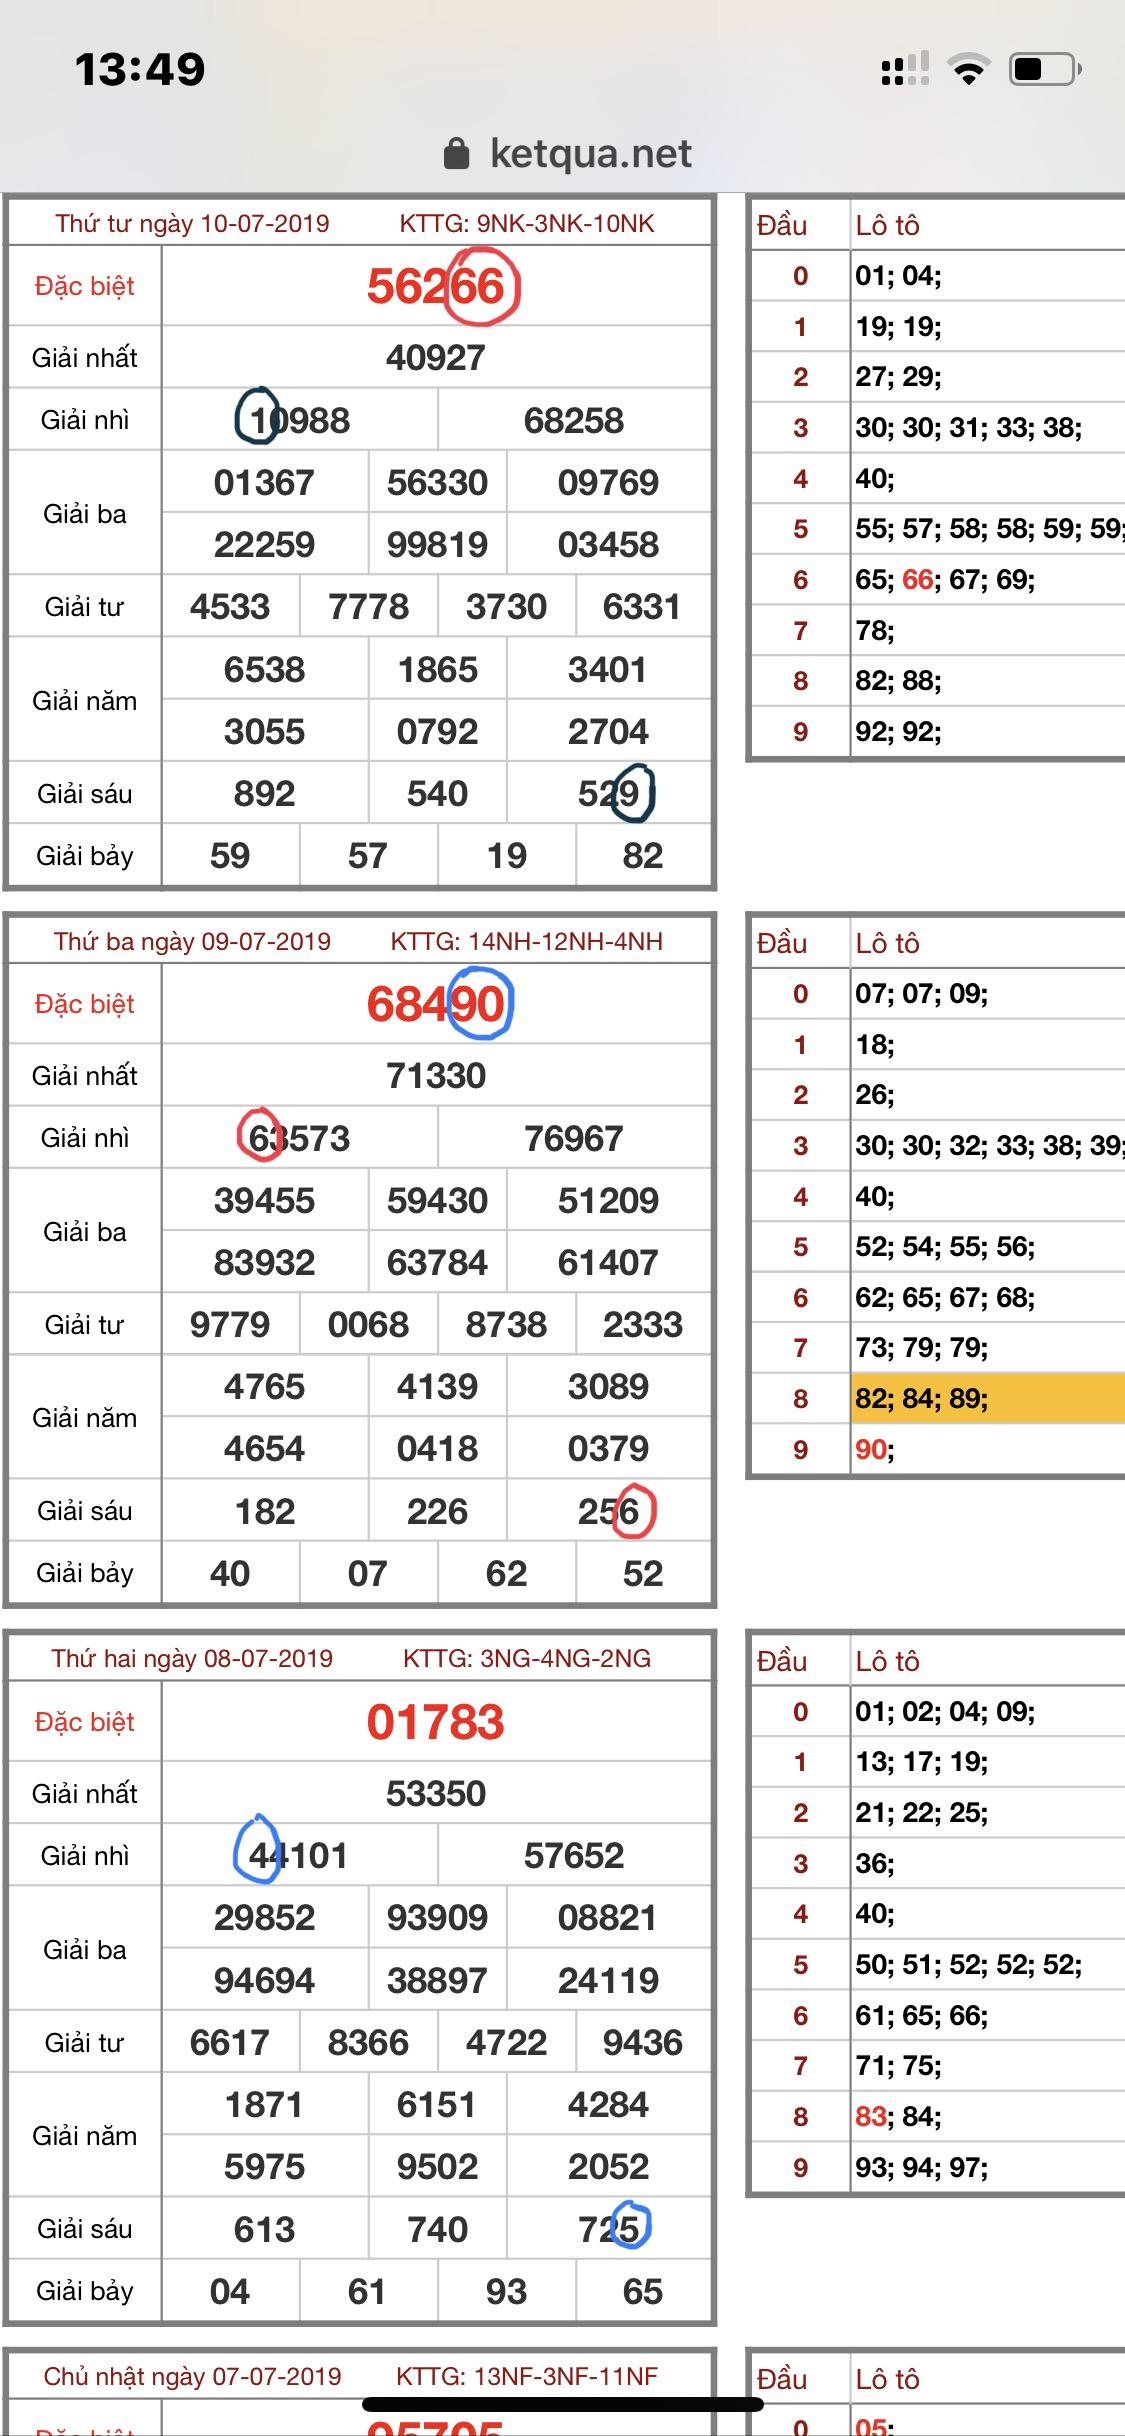 059B9F65-0DF0-4DE2-B9CF-4825CEAE581B.jpeg